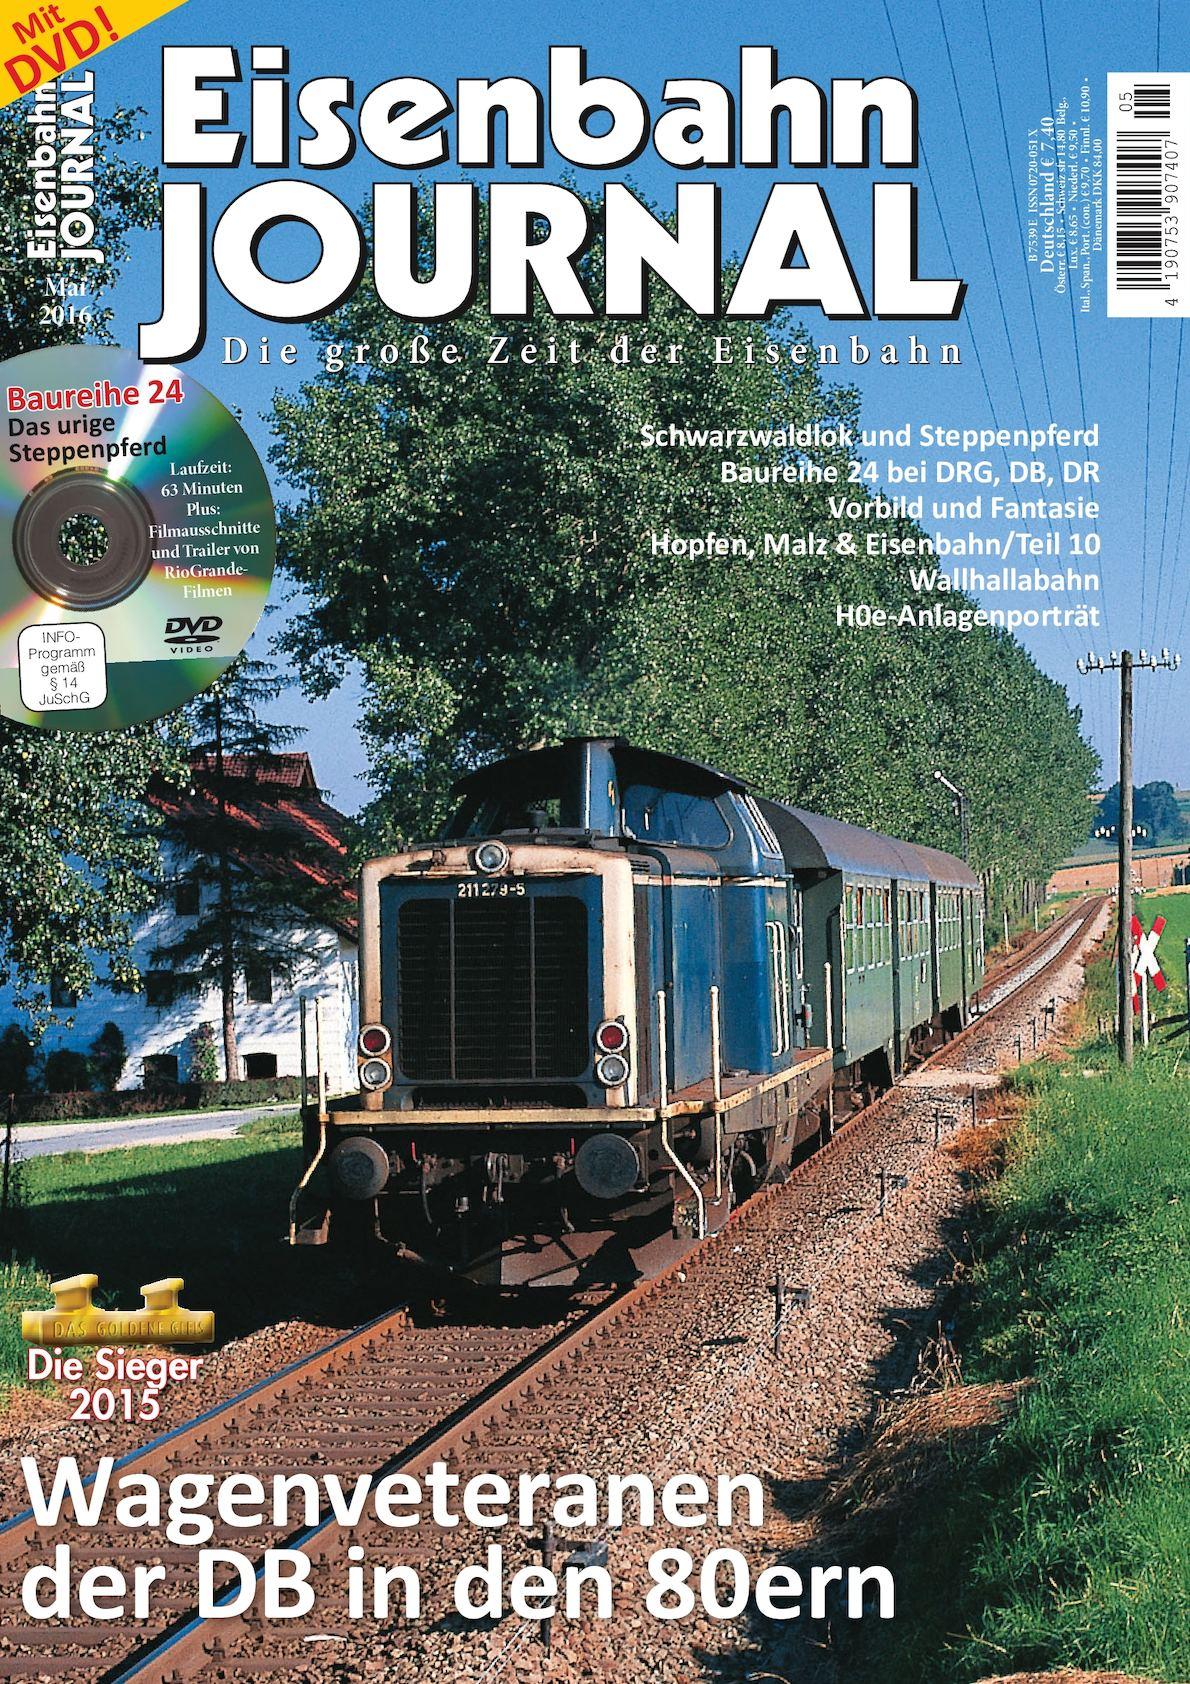 Eisenbahn Journal 05 2016